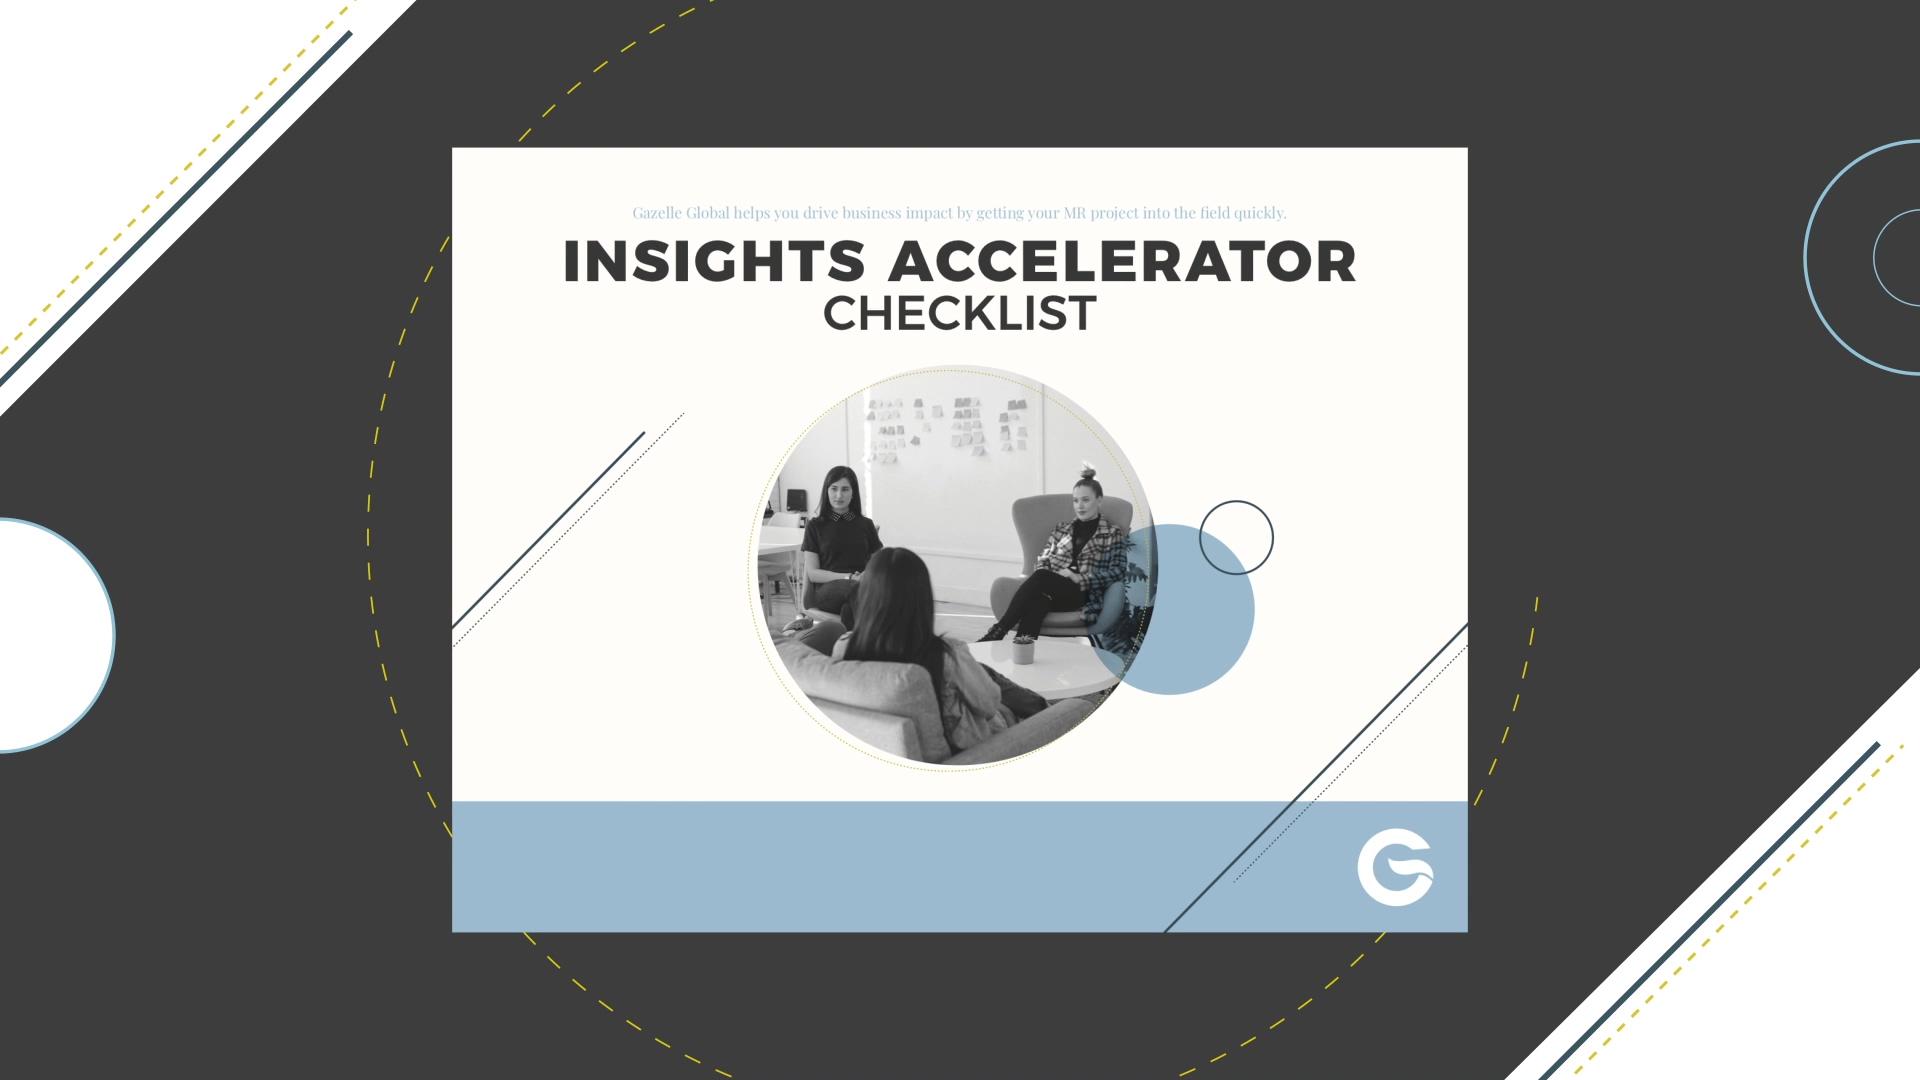 gazelle-global-insights-accelerator-checklist-lp-video